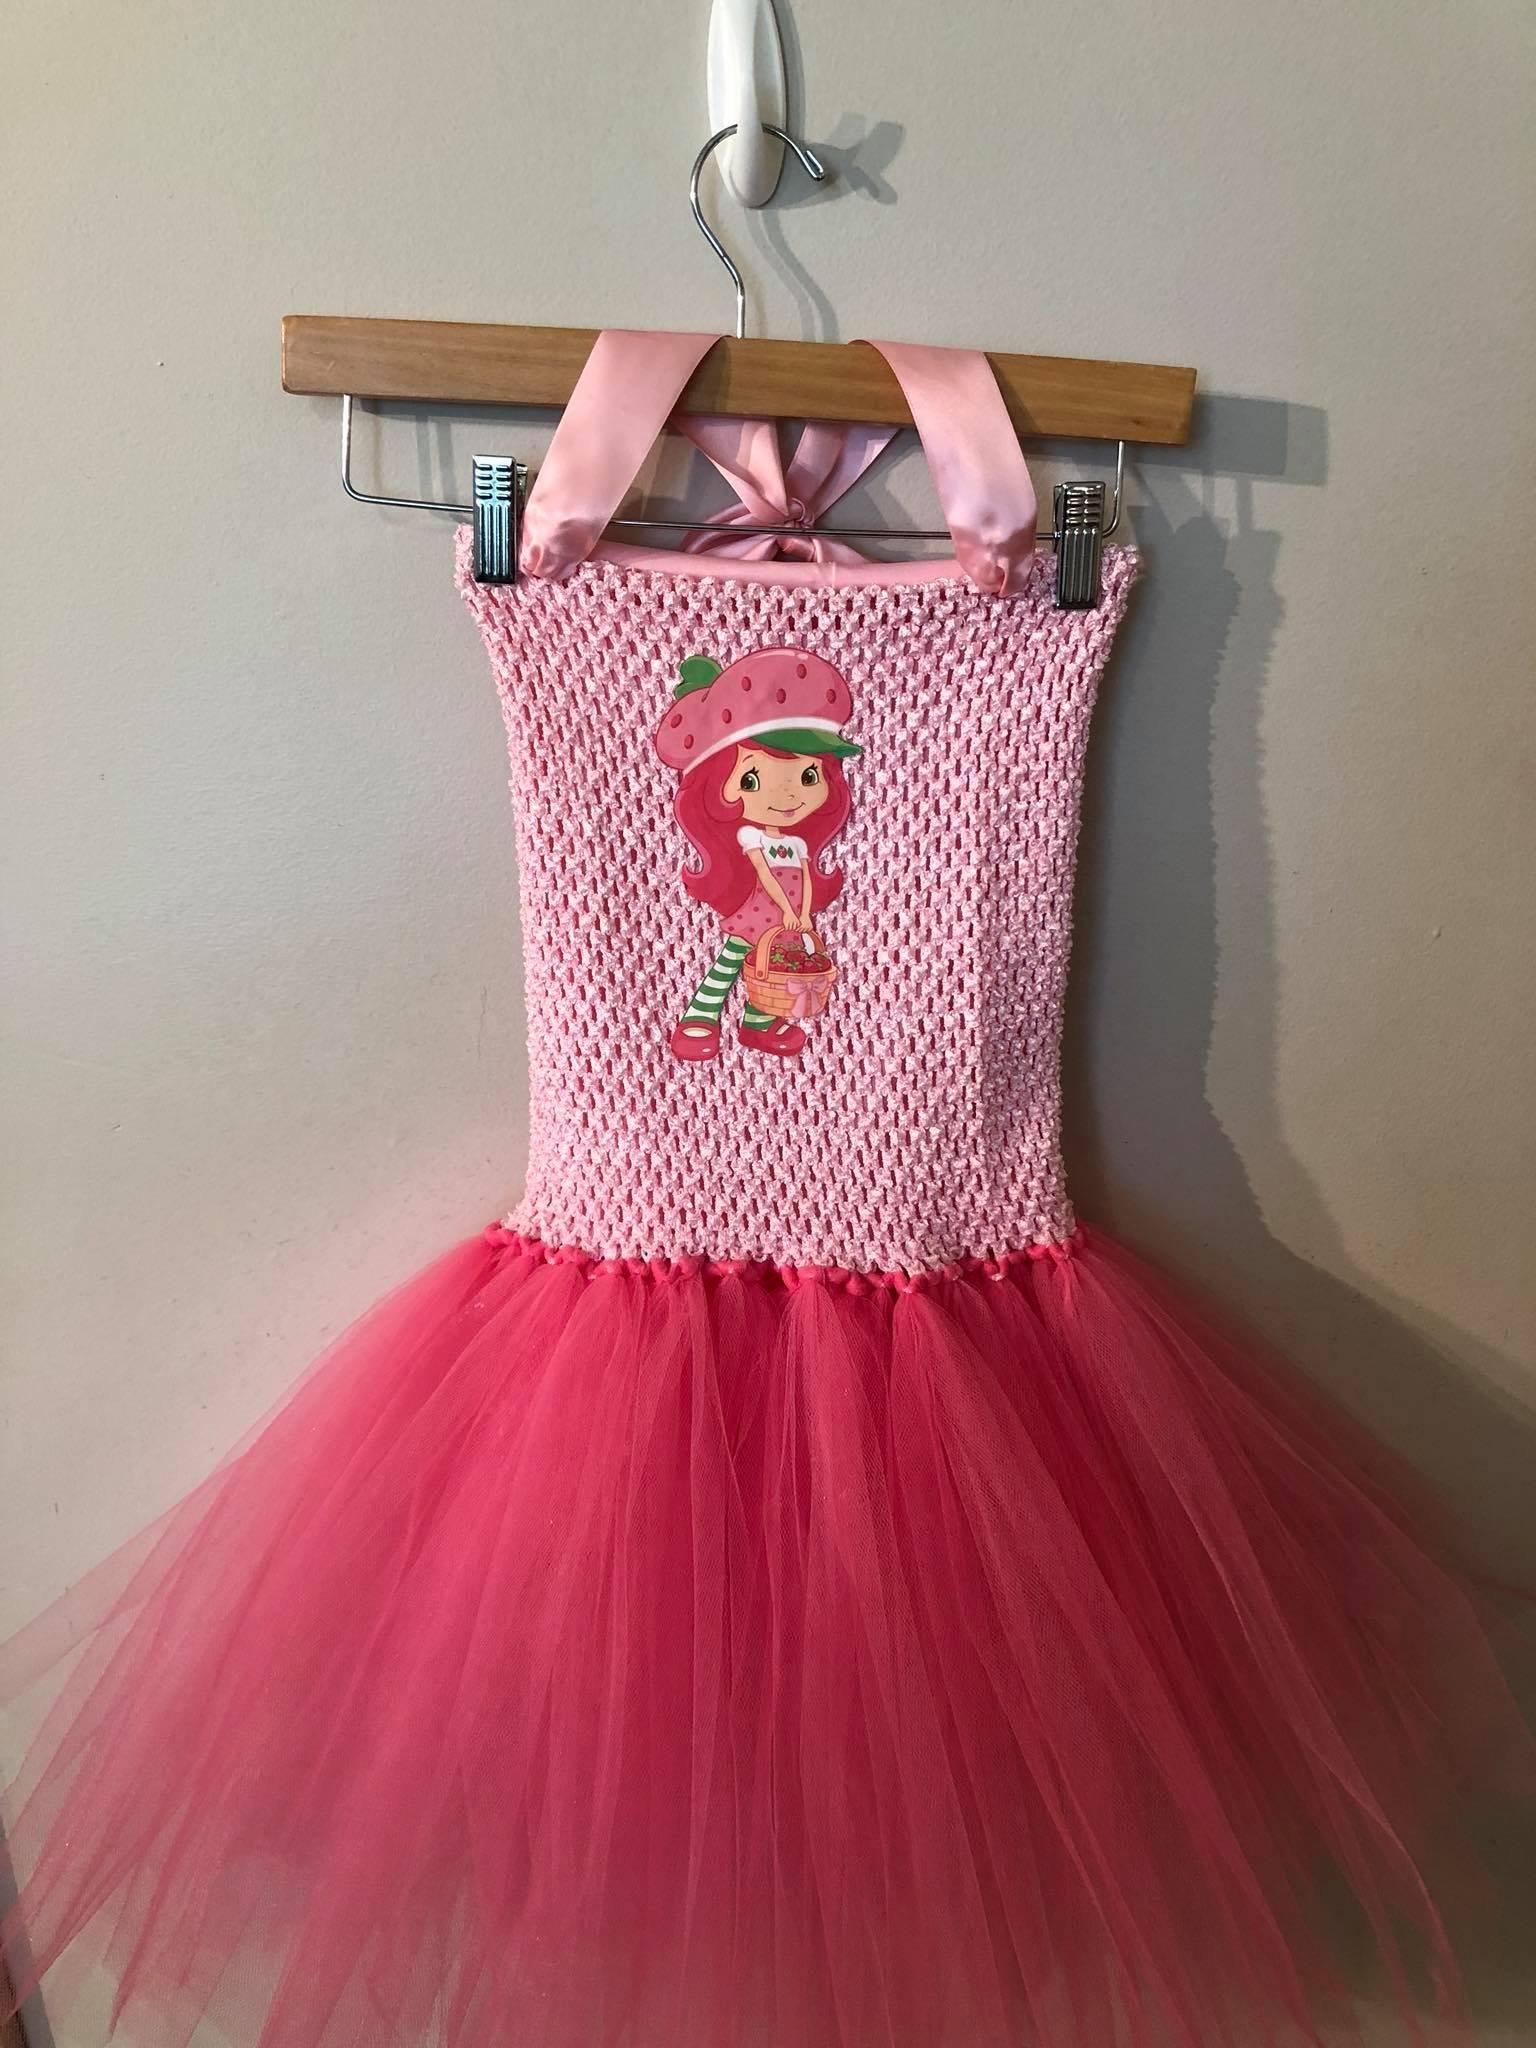 Strawberry Shortcake Tutu Dress 4T - 7/8y